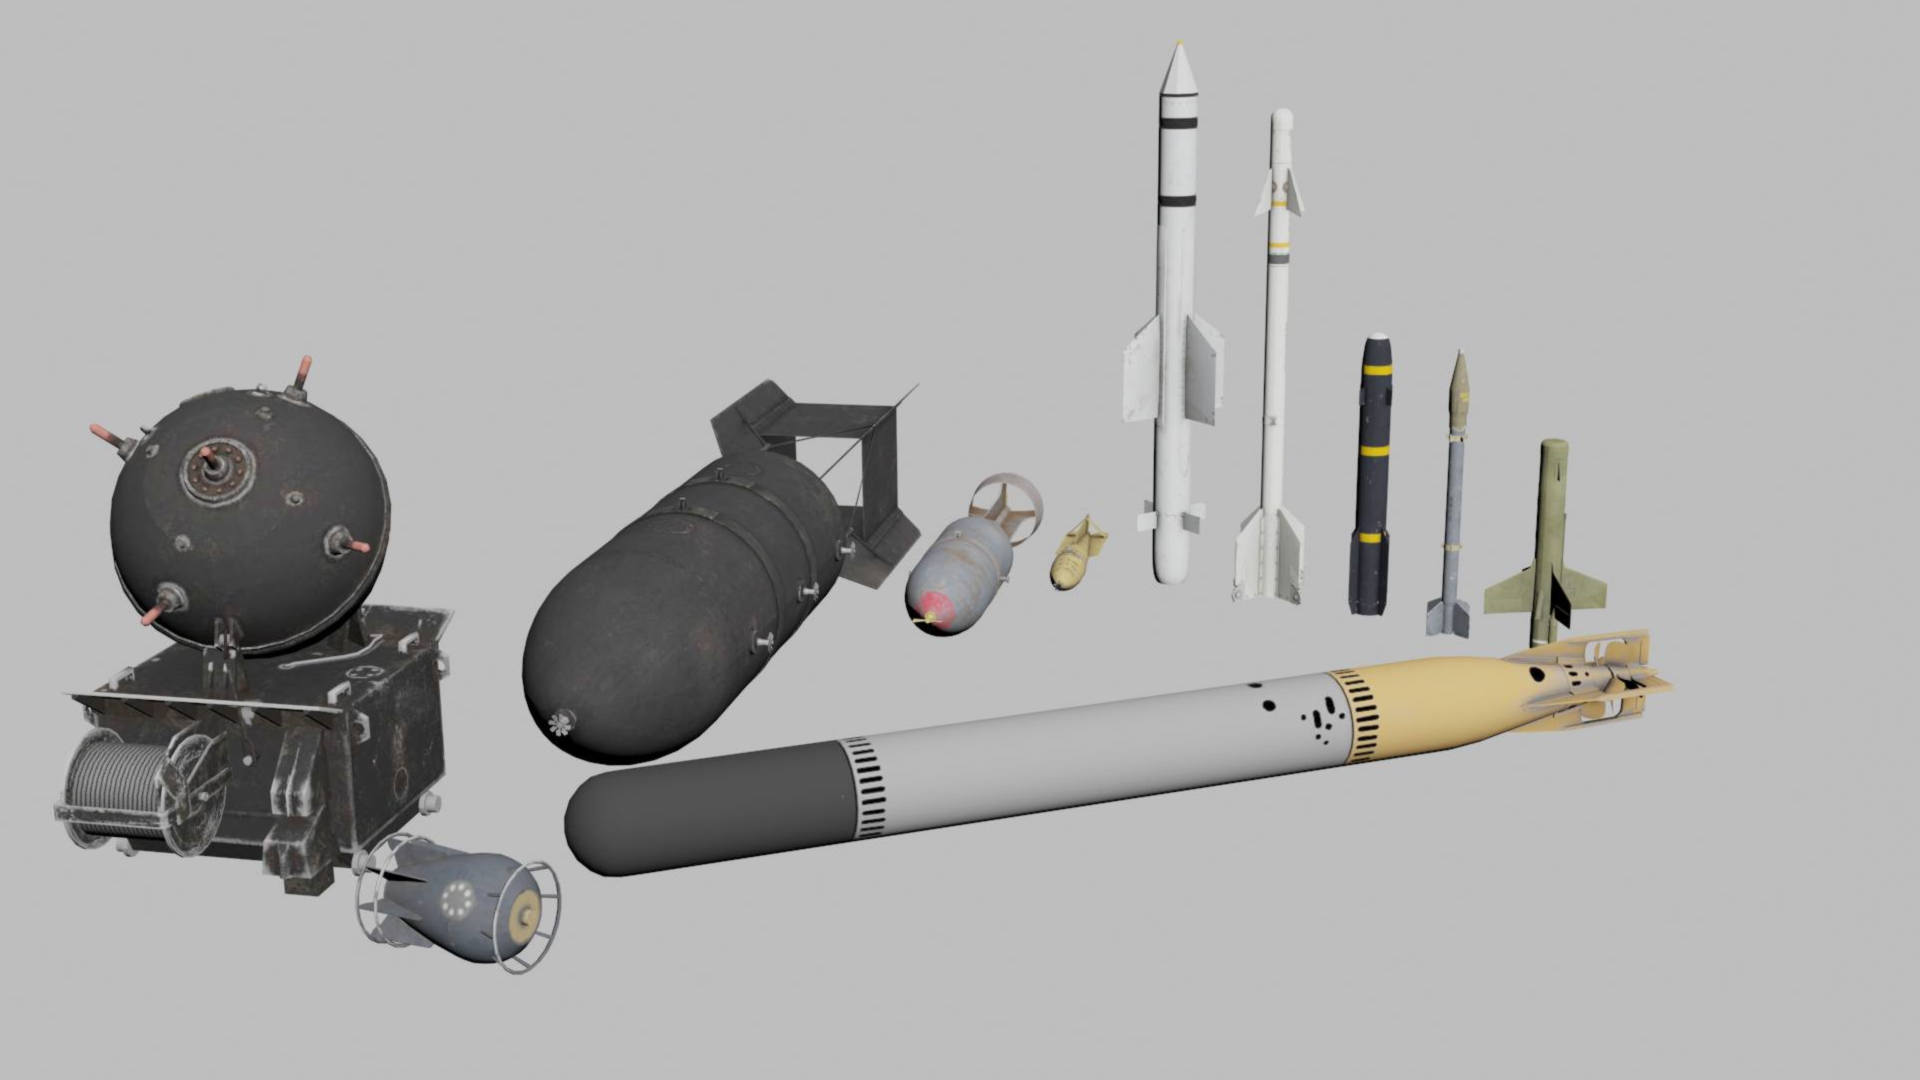 Ракеты, бомбы, снаряды